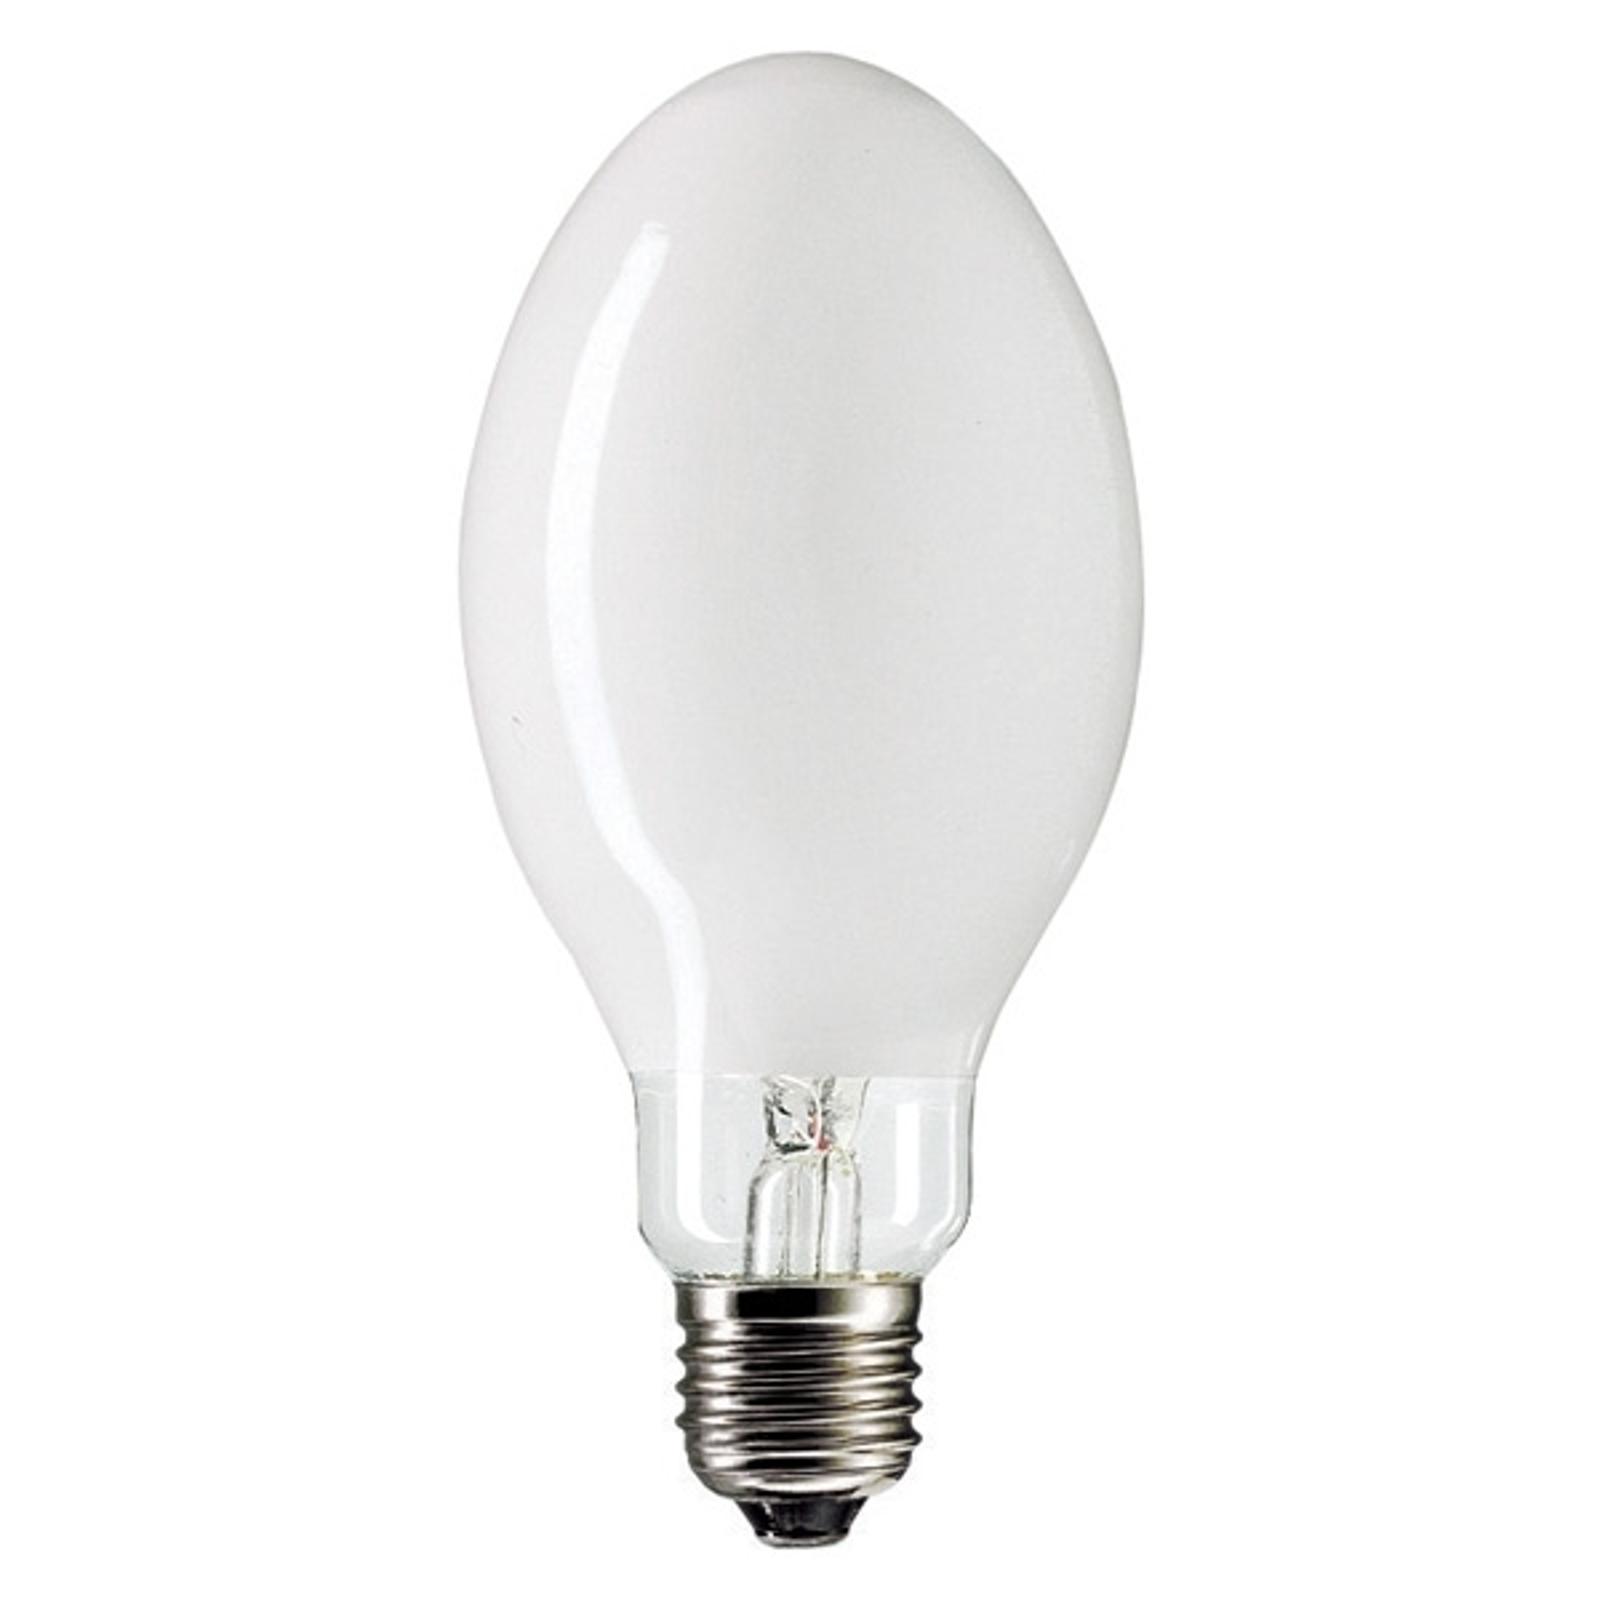 E27 70W 828 Metallhalogendampflampe Master CDO-ET